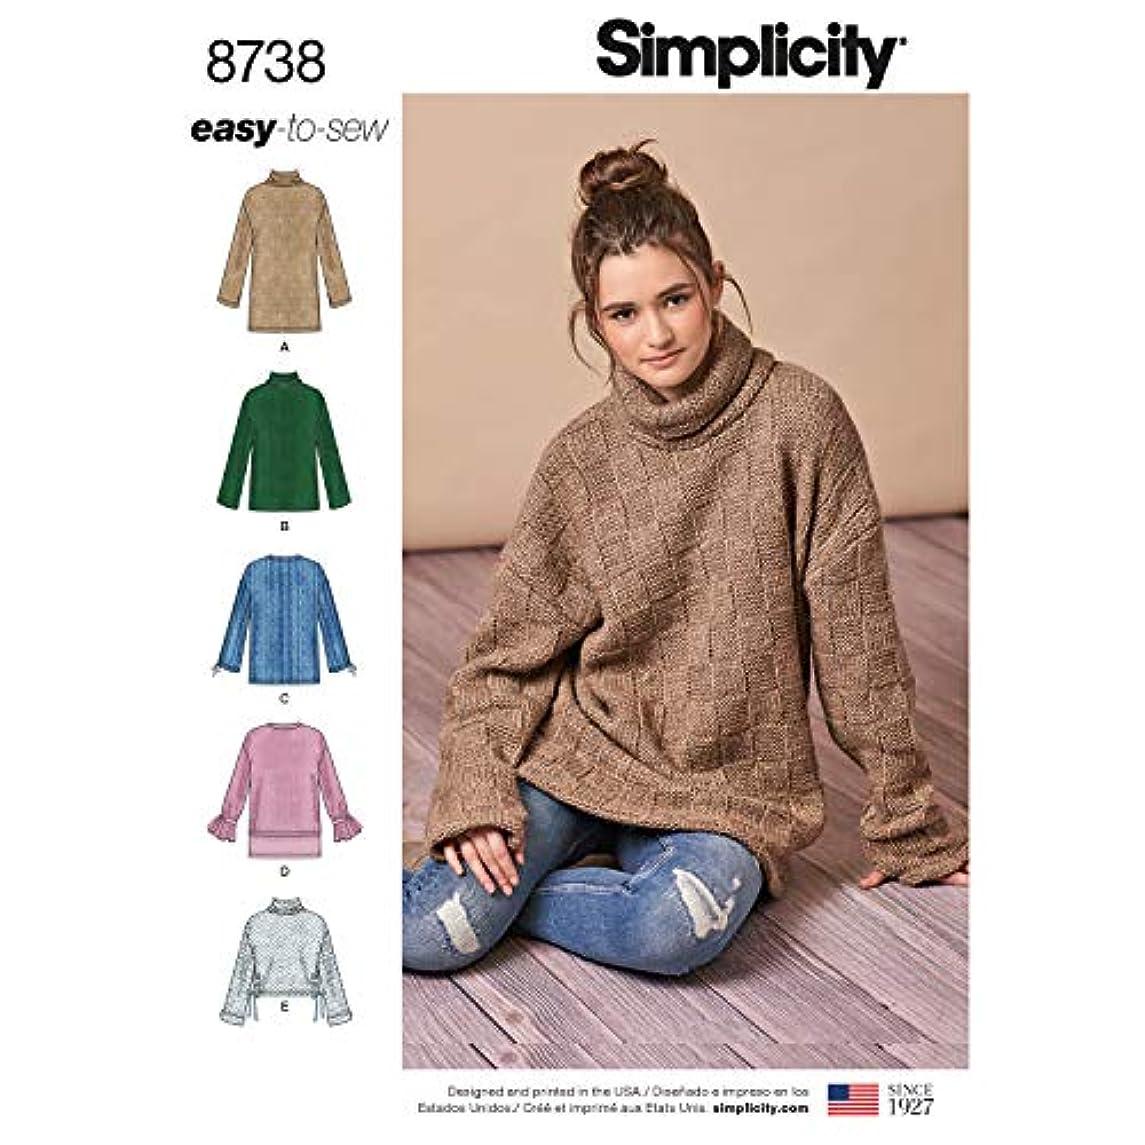 Simplicity Patterns US8738A Tops, Vest, JKTS, Coats, A (A (XXS-XS-S-M-L-XL-XXL)